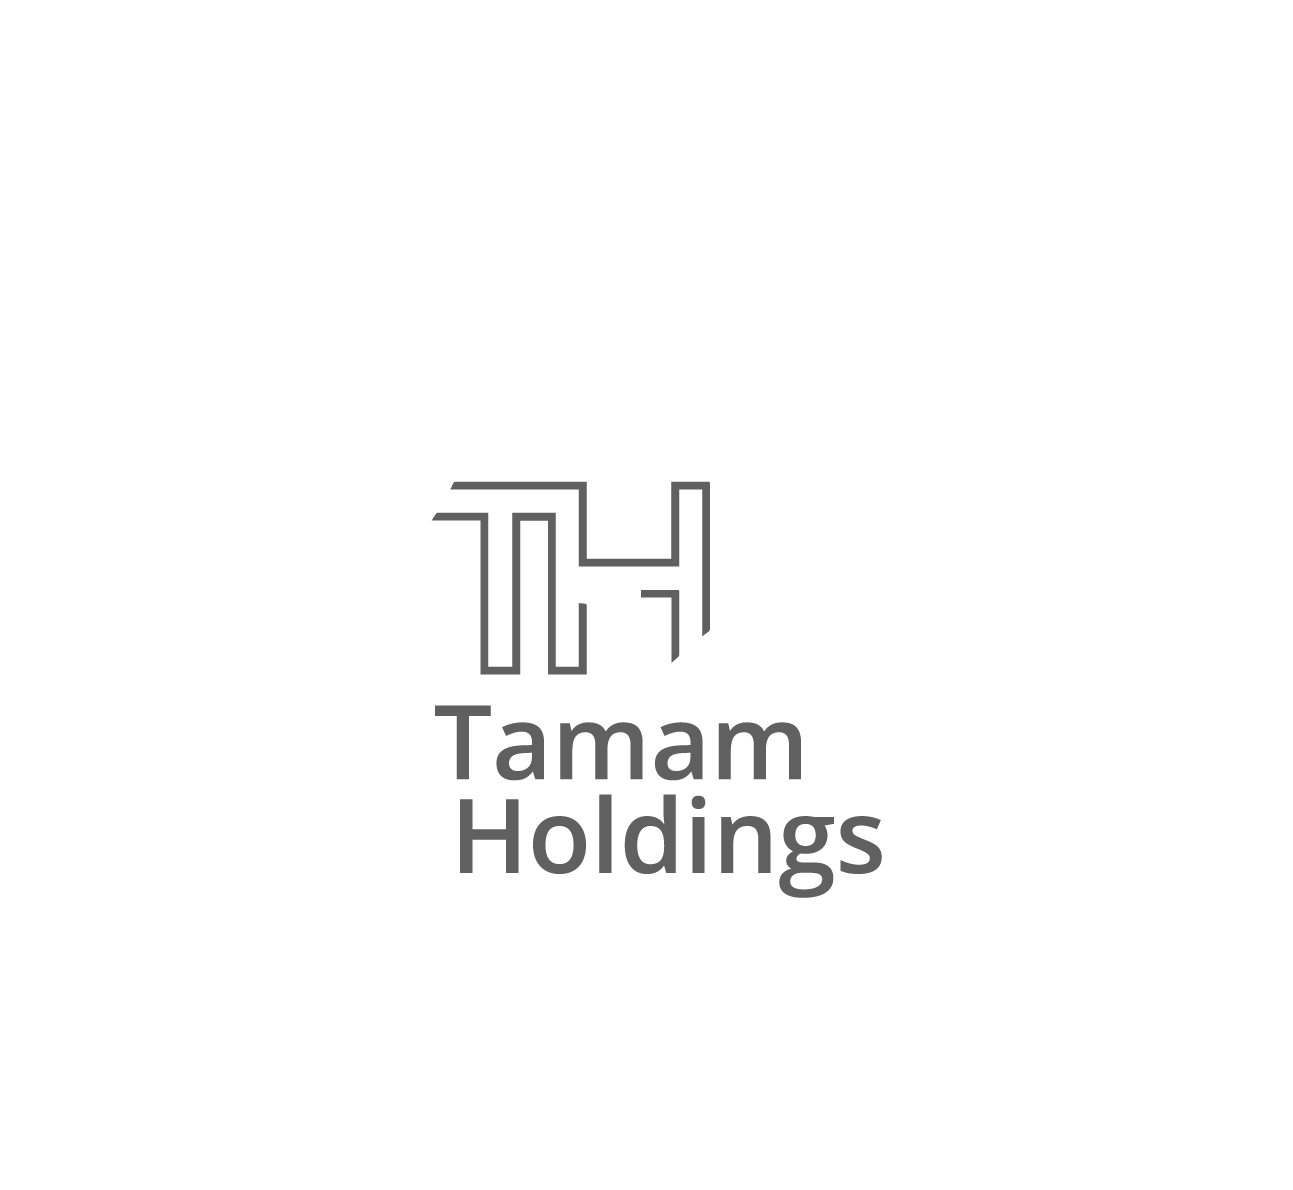 Tamam Holdings Limited